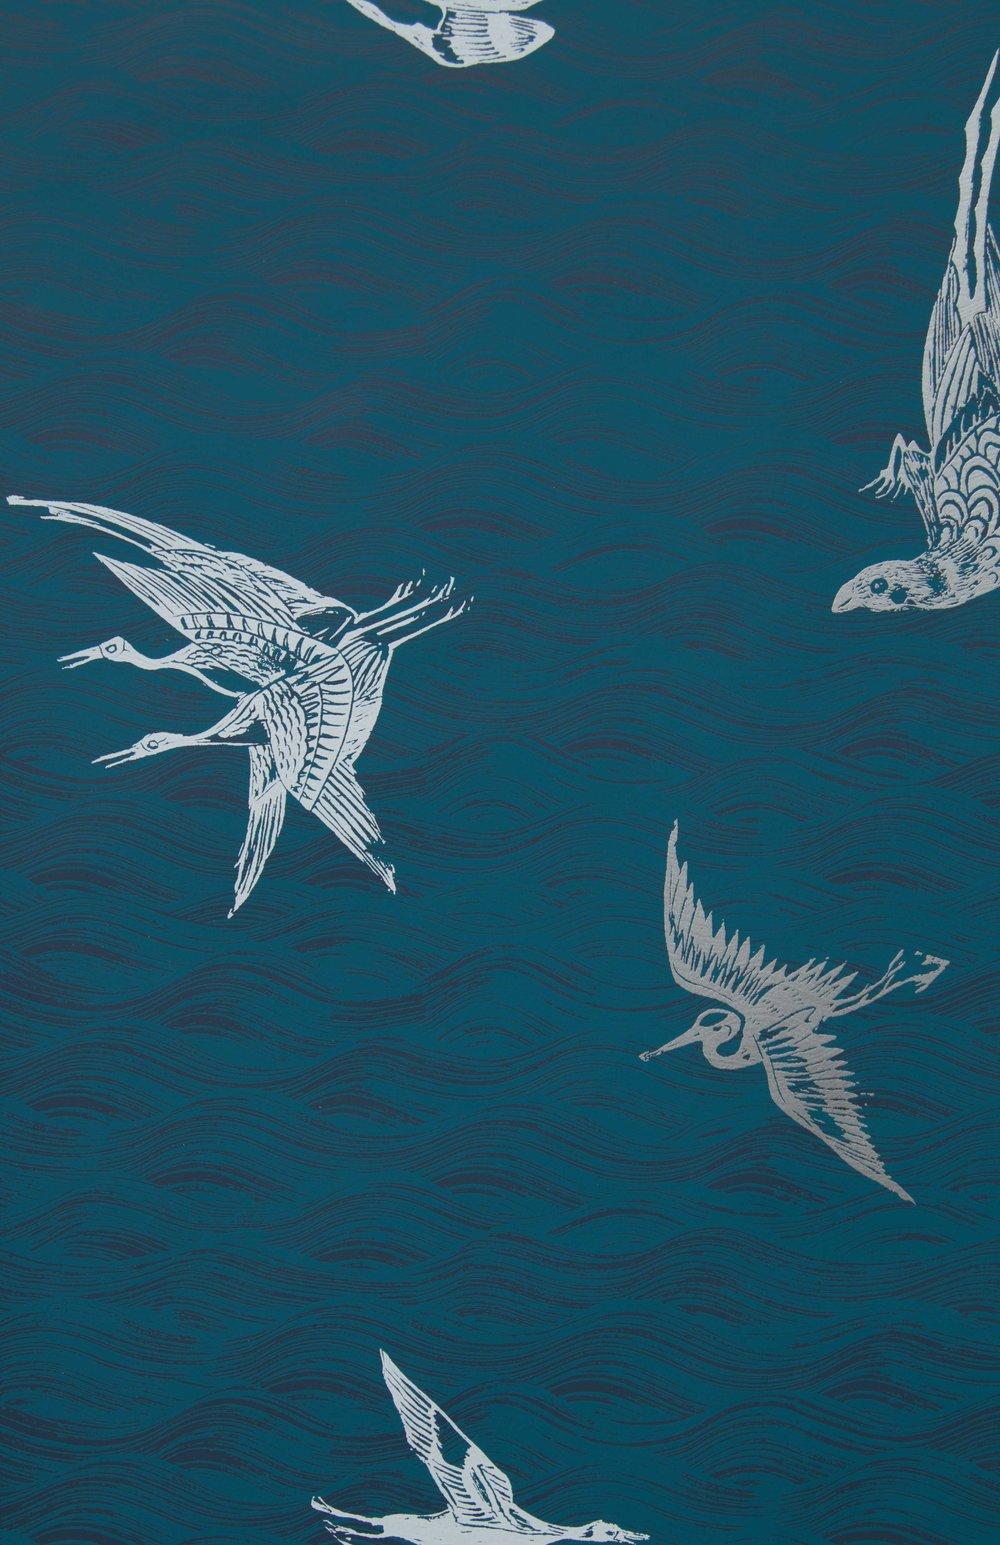 Birds in Azure, SL120-01